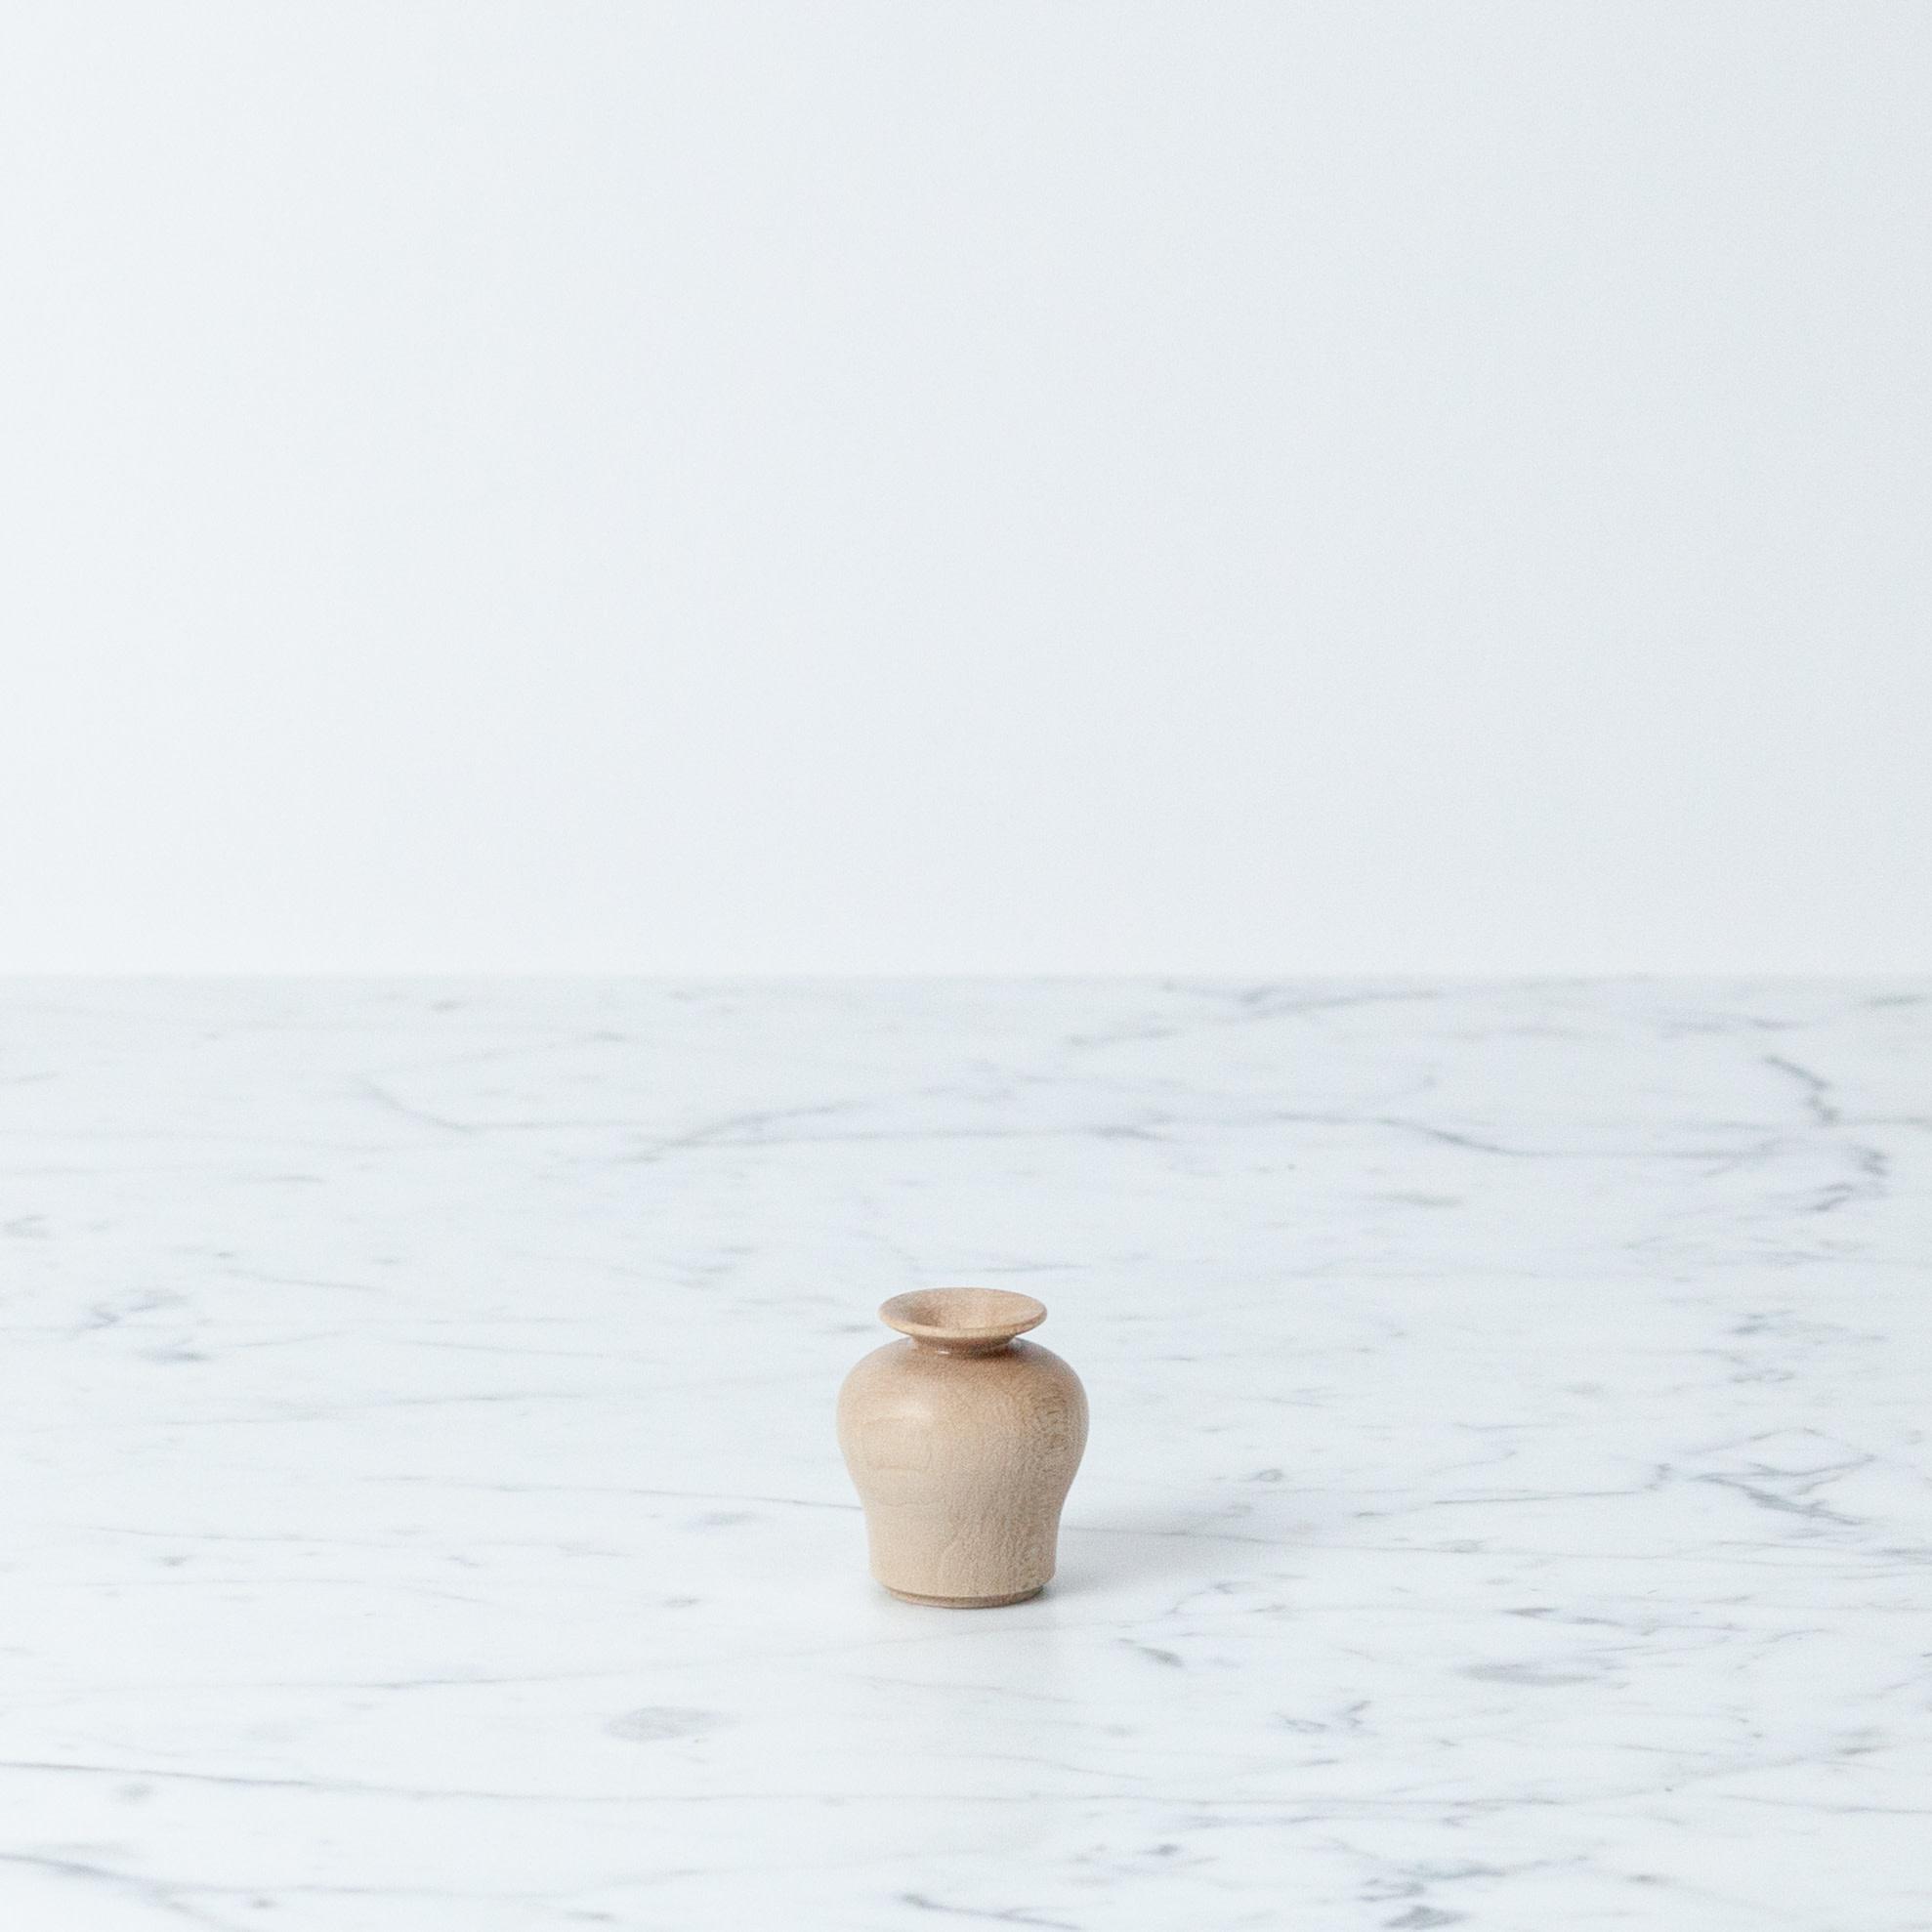 akarino-tane Small Maple Flower Vase - Crouch